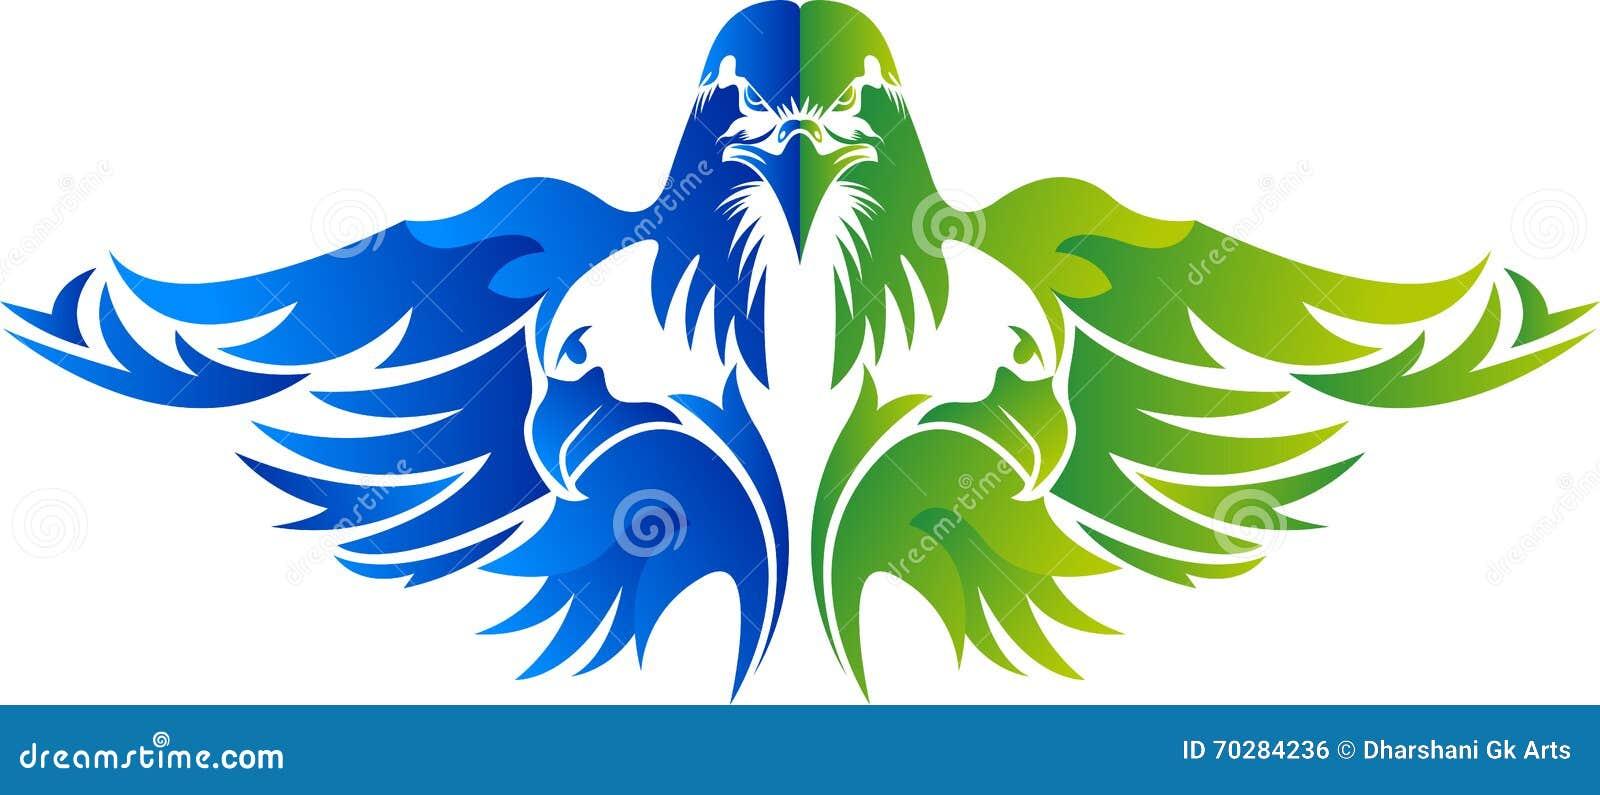 eagle logo design stock vector illustration of clip 70284236